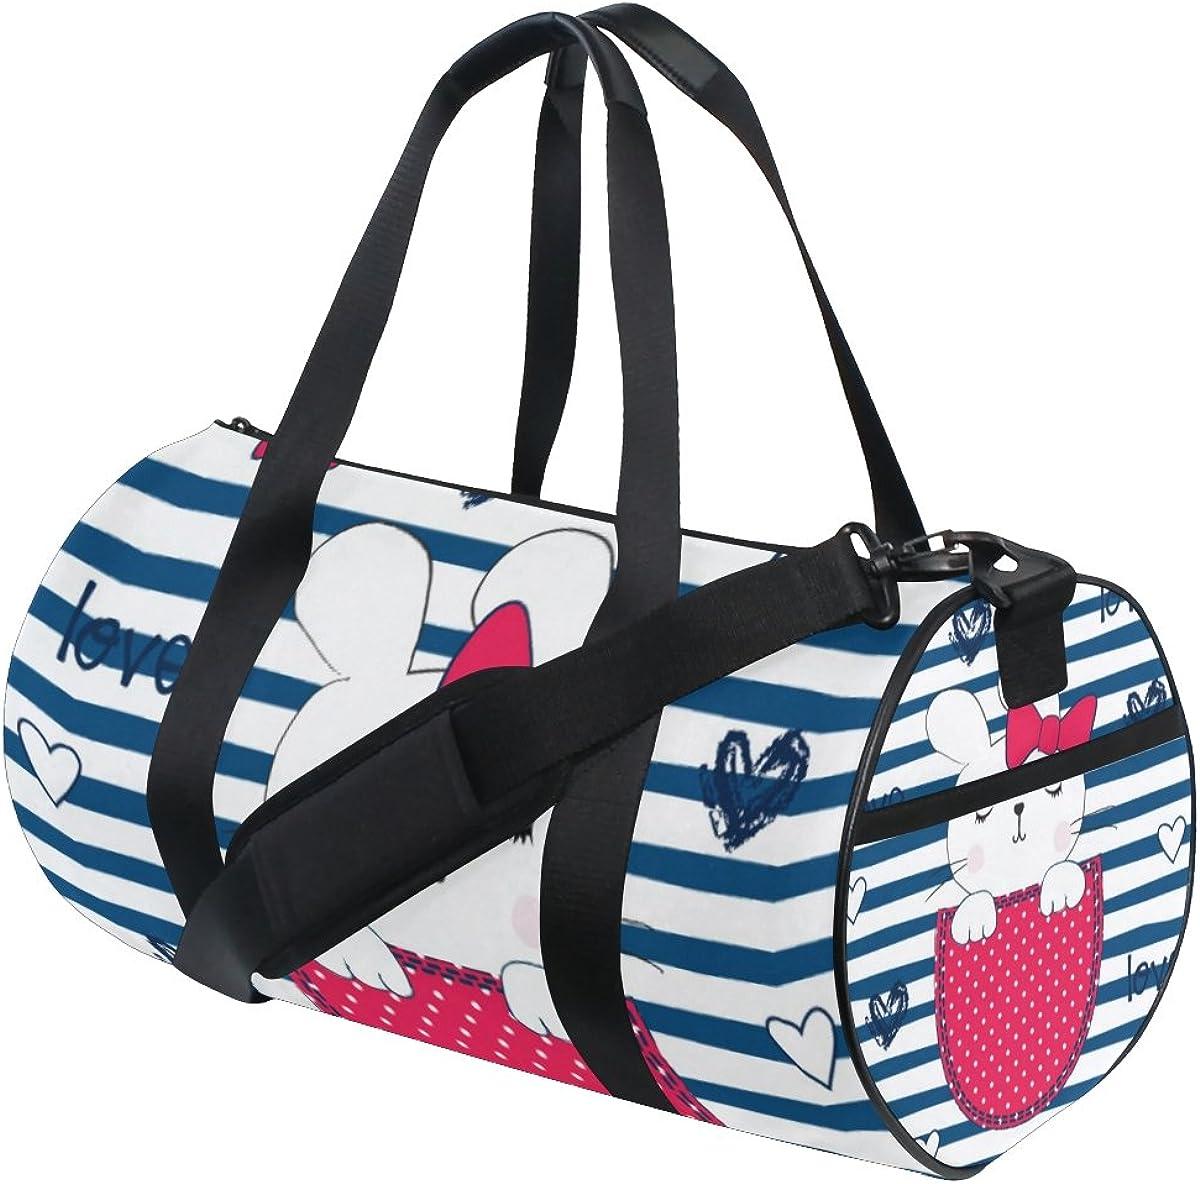 Travel Duffels Sleeping Girl Duffle Bag Luggage Sports Gym for Women /& Men